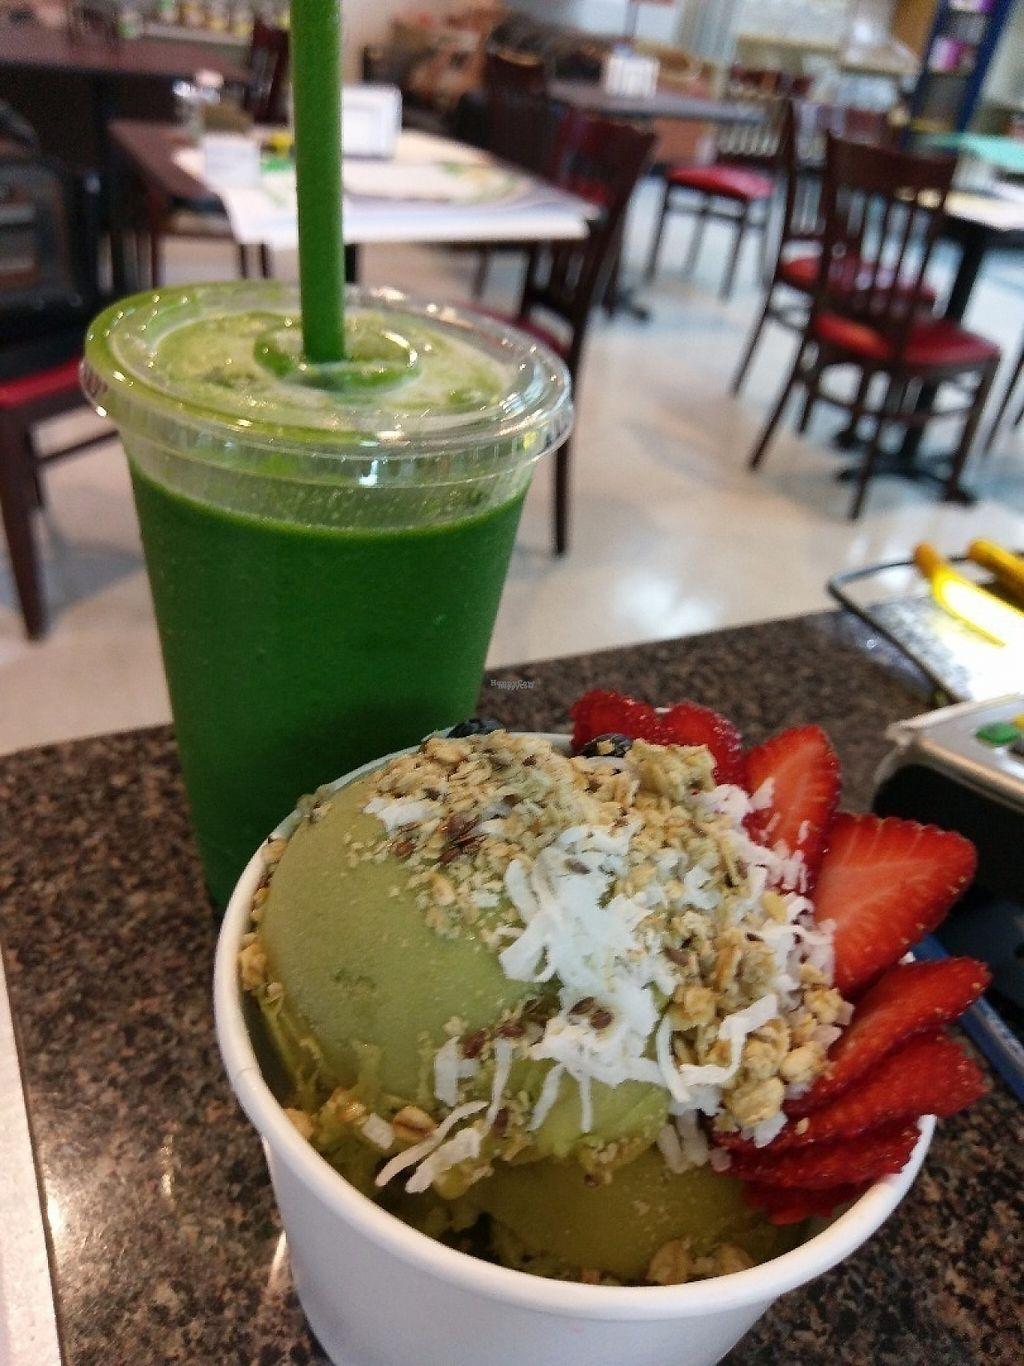 Nutrition Shoppe Juice and Sandwich Bar - Vacaville